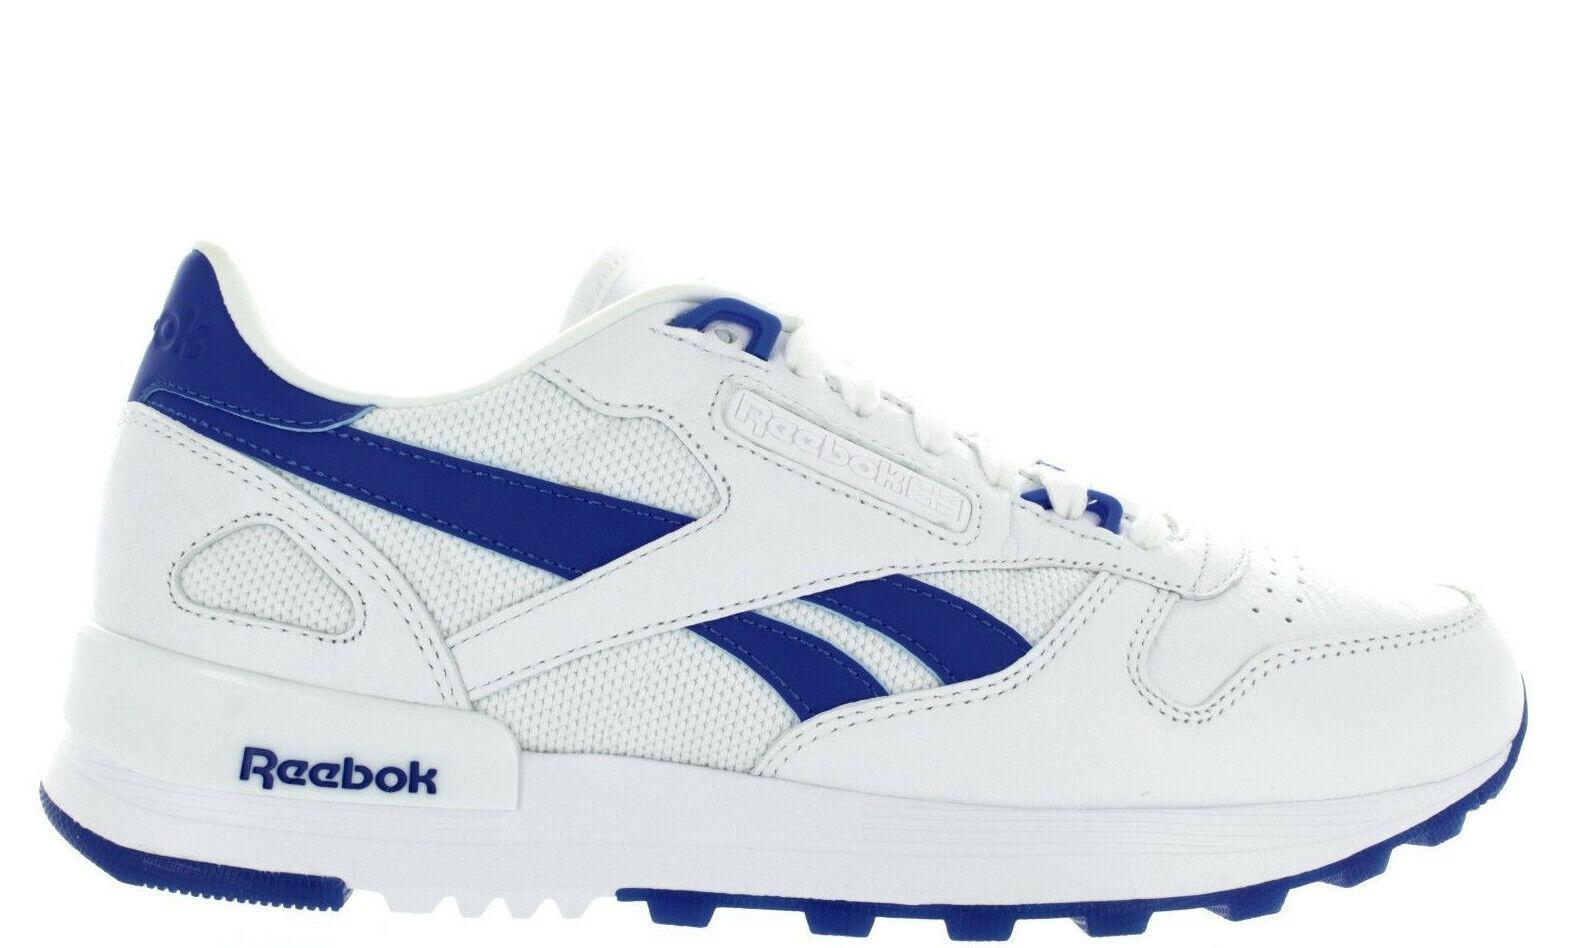 MEN'S REEBOK CL LEATHER 2 0 BS8426 WHITE VITAL blueeE blueeE